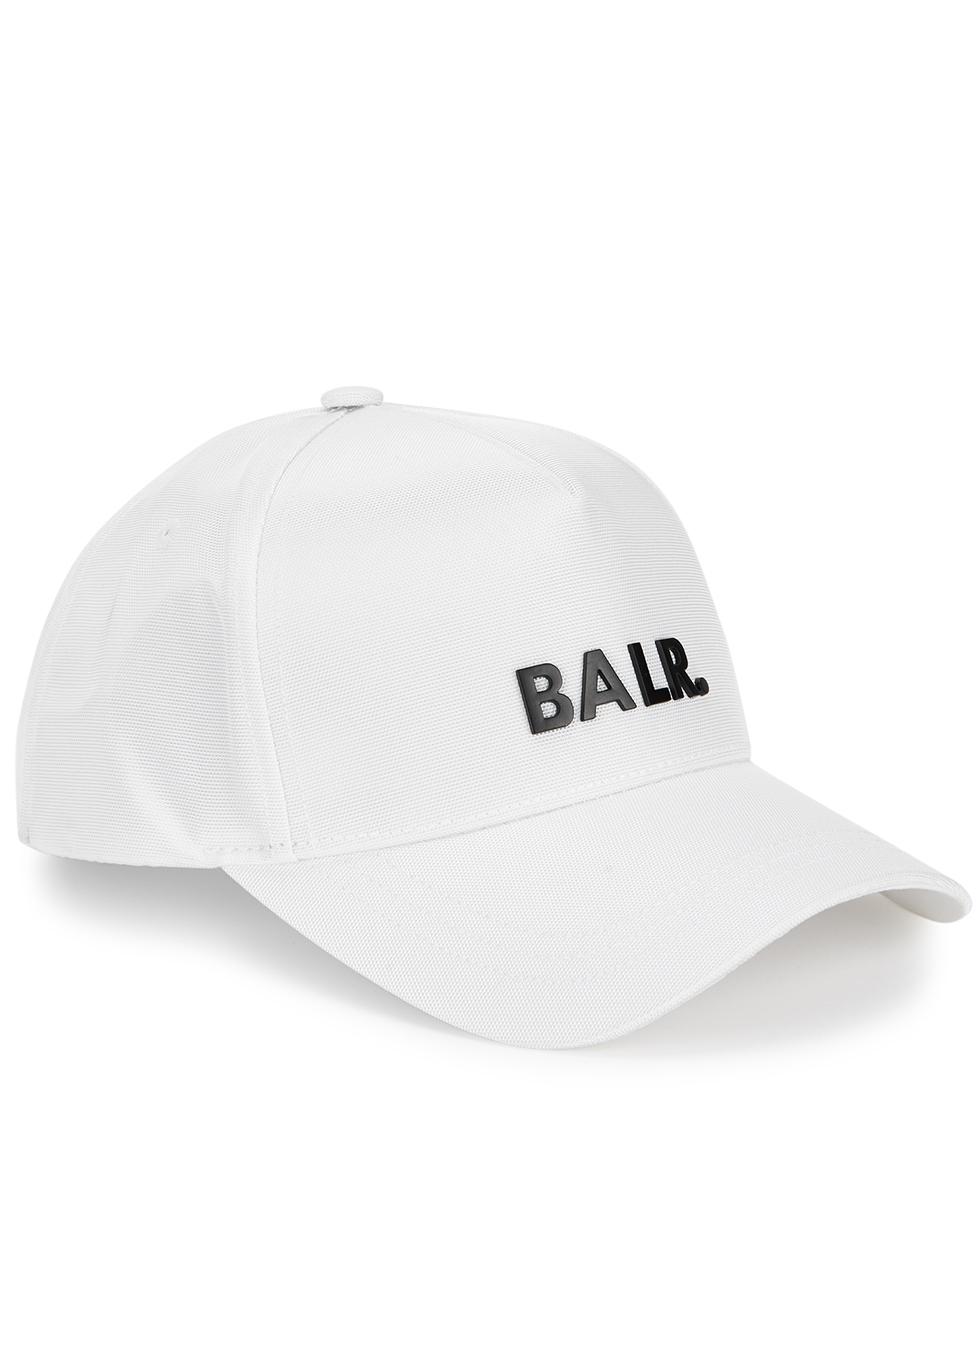 White logo canvas cap